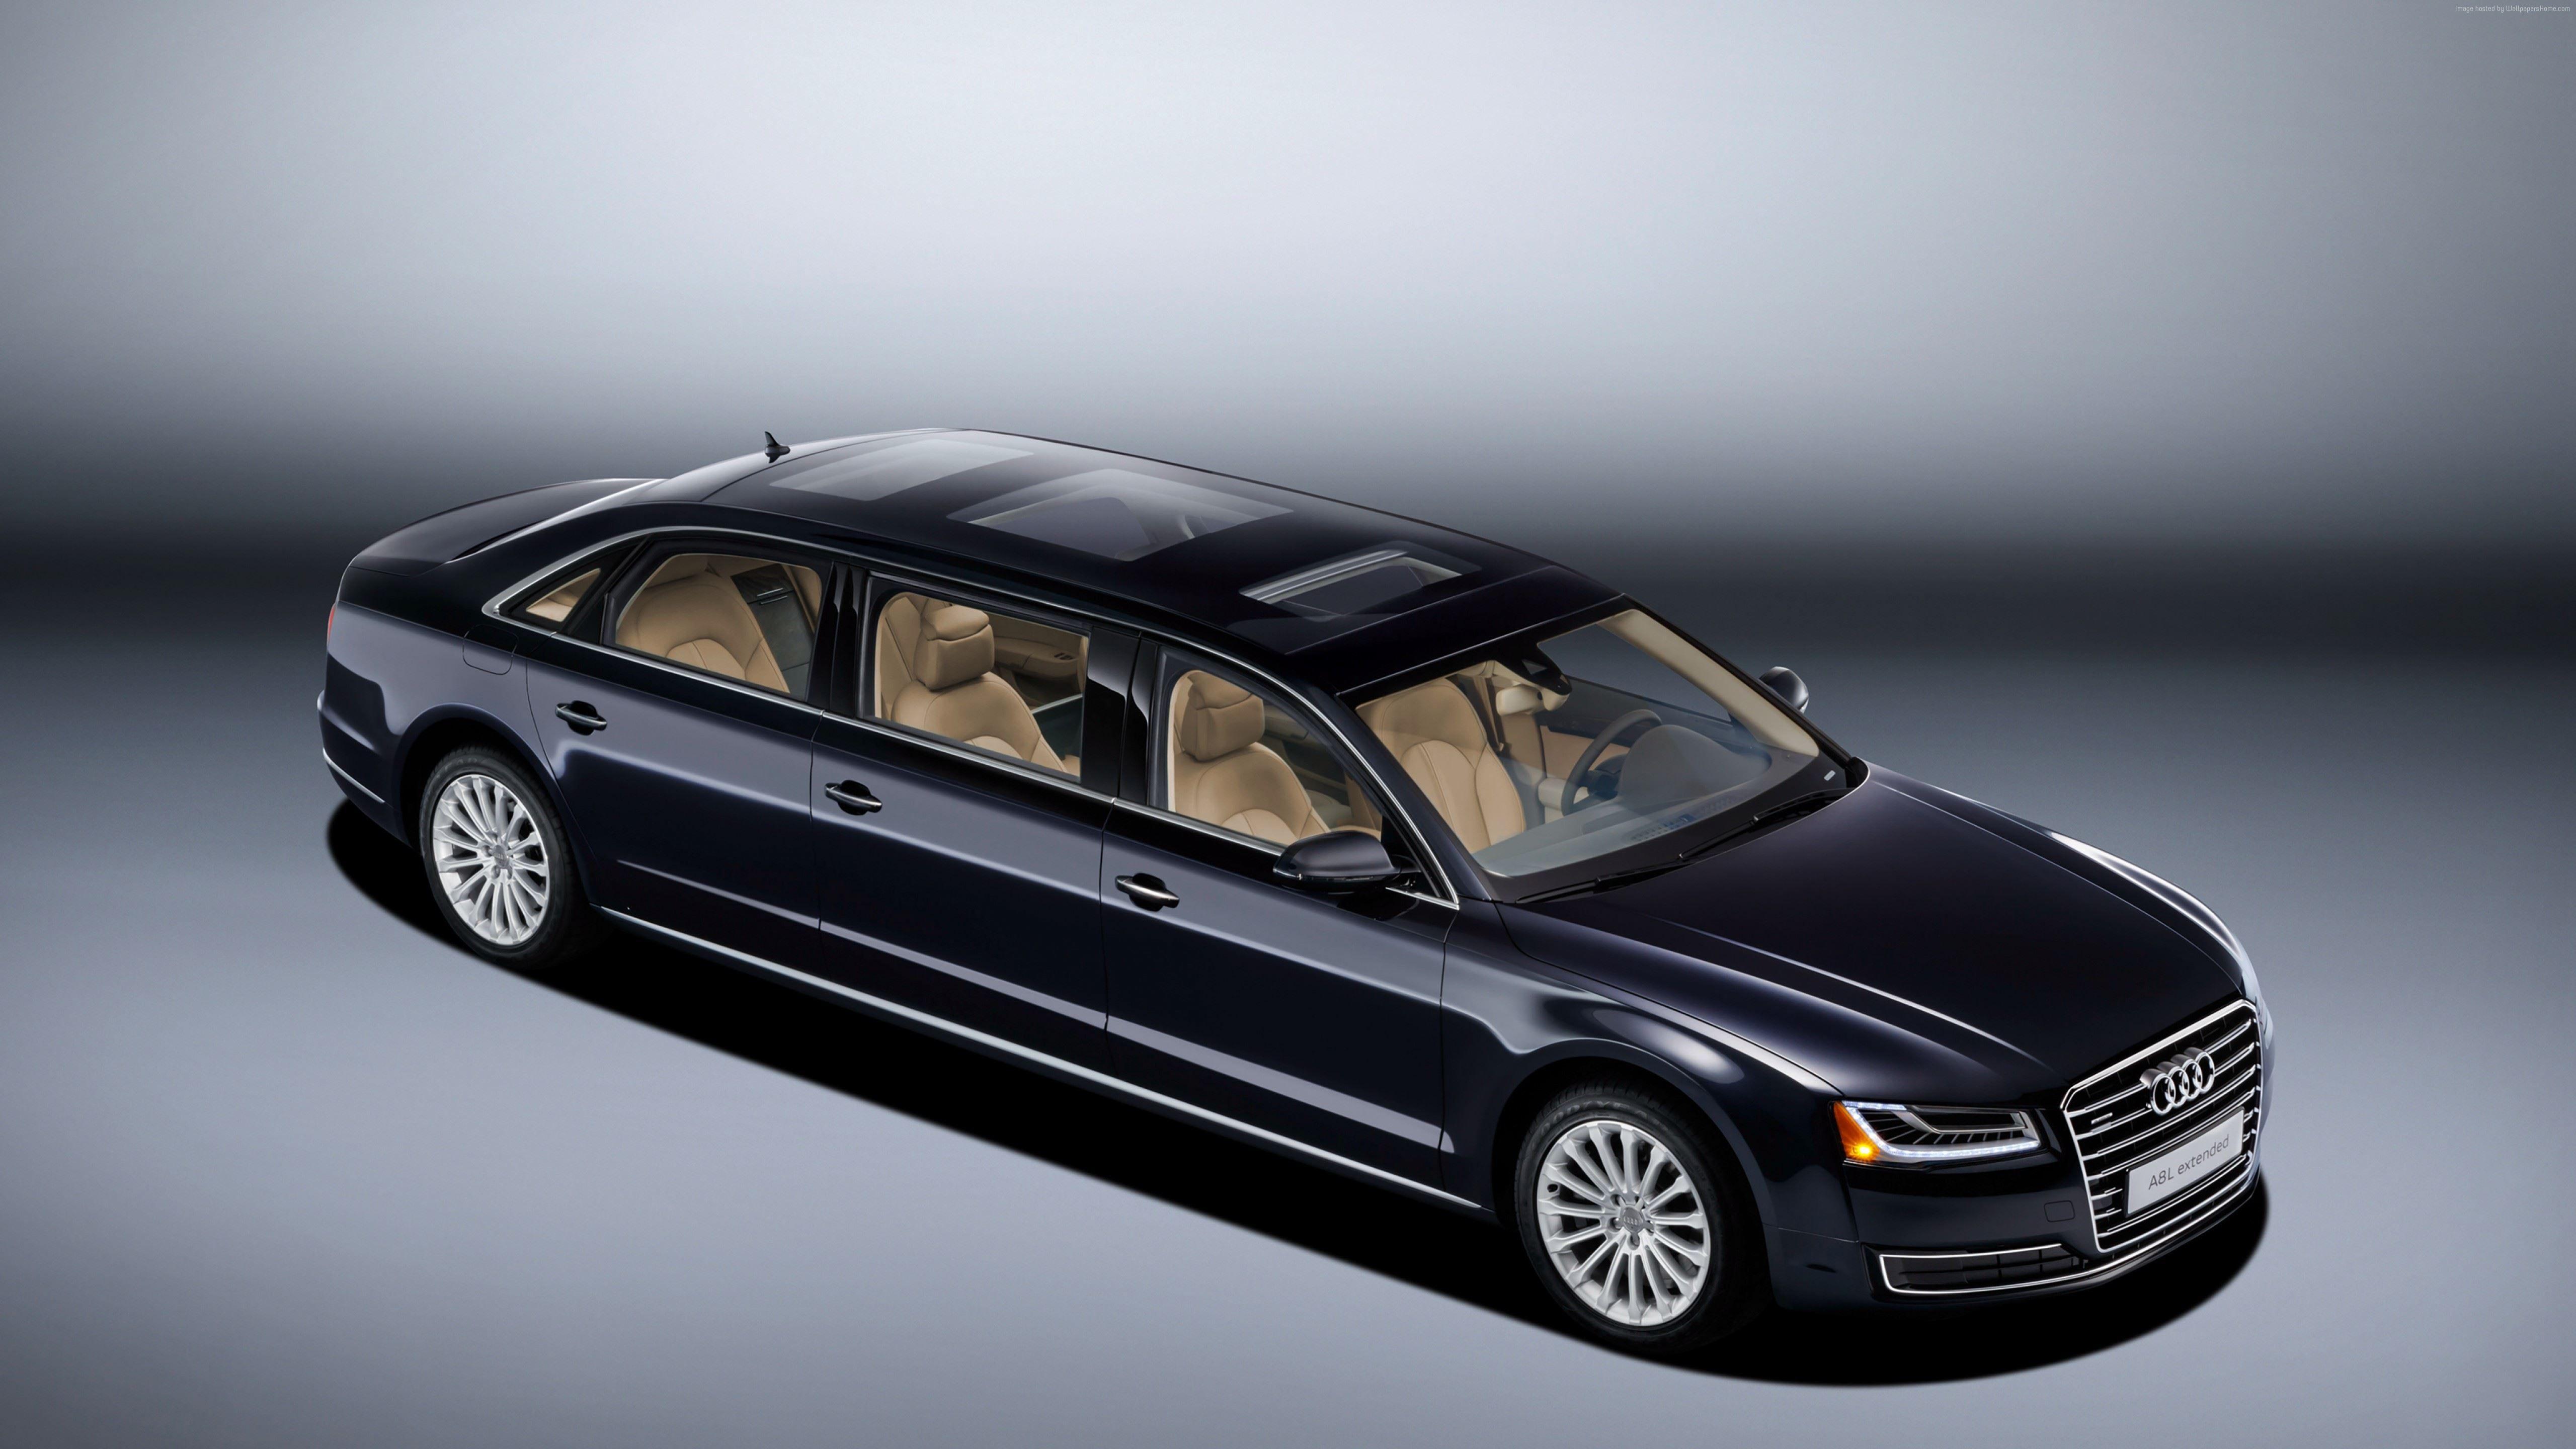 Audi A8 L Extende, luxury cars, limuzin – Classic Cars & Bikes –  Wallpapers HD …